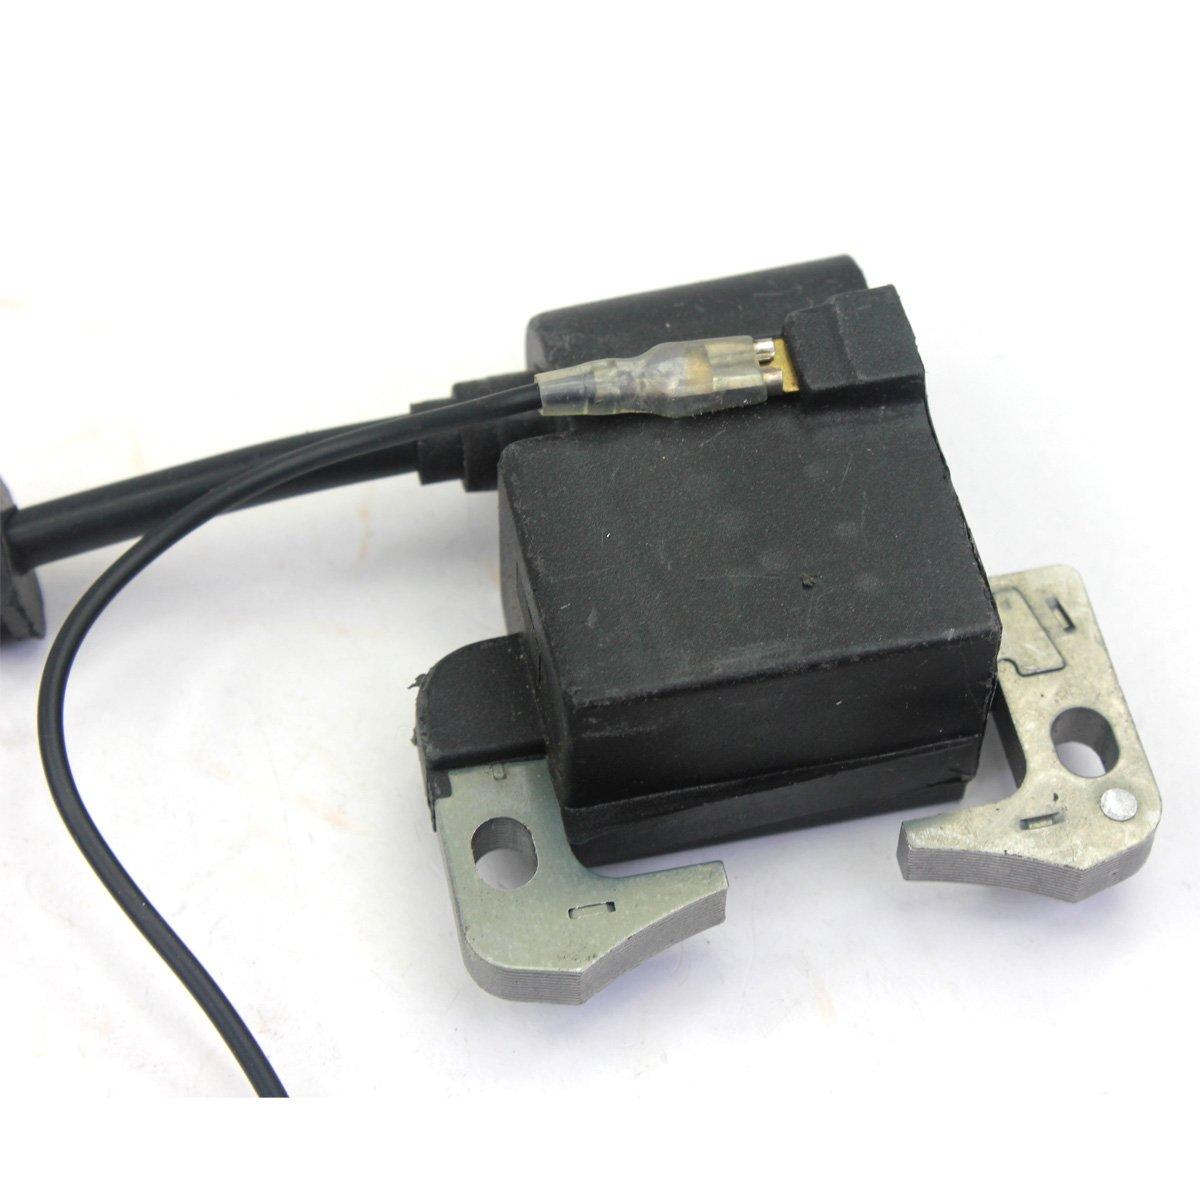 Pocket Bike Wiring Diagram In Addition Mini Chopper Pocket Bike Wiring